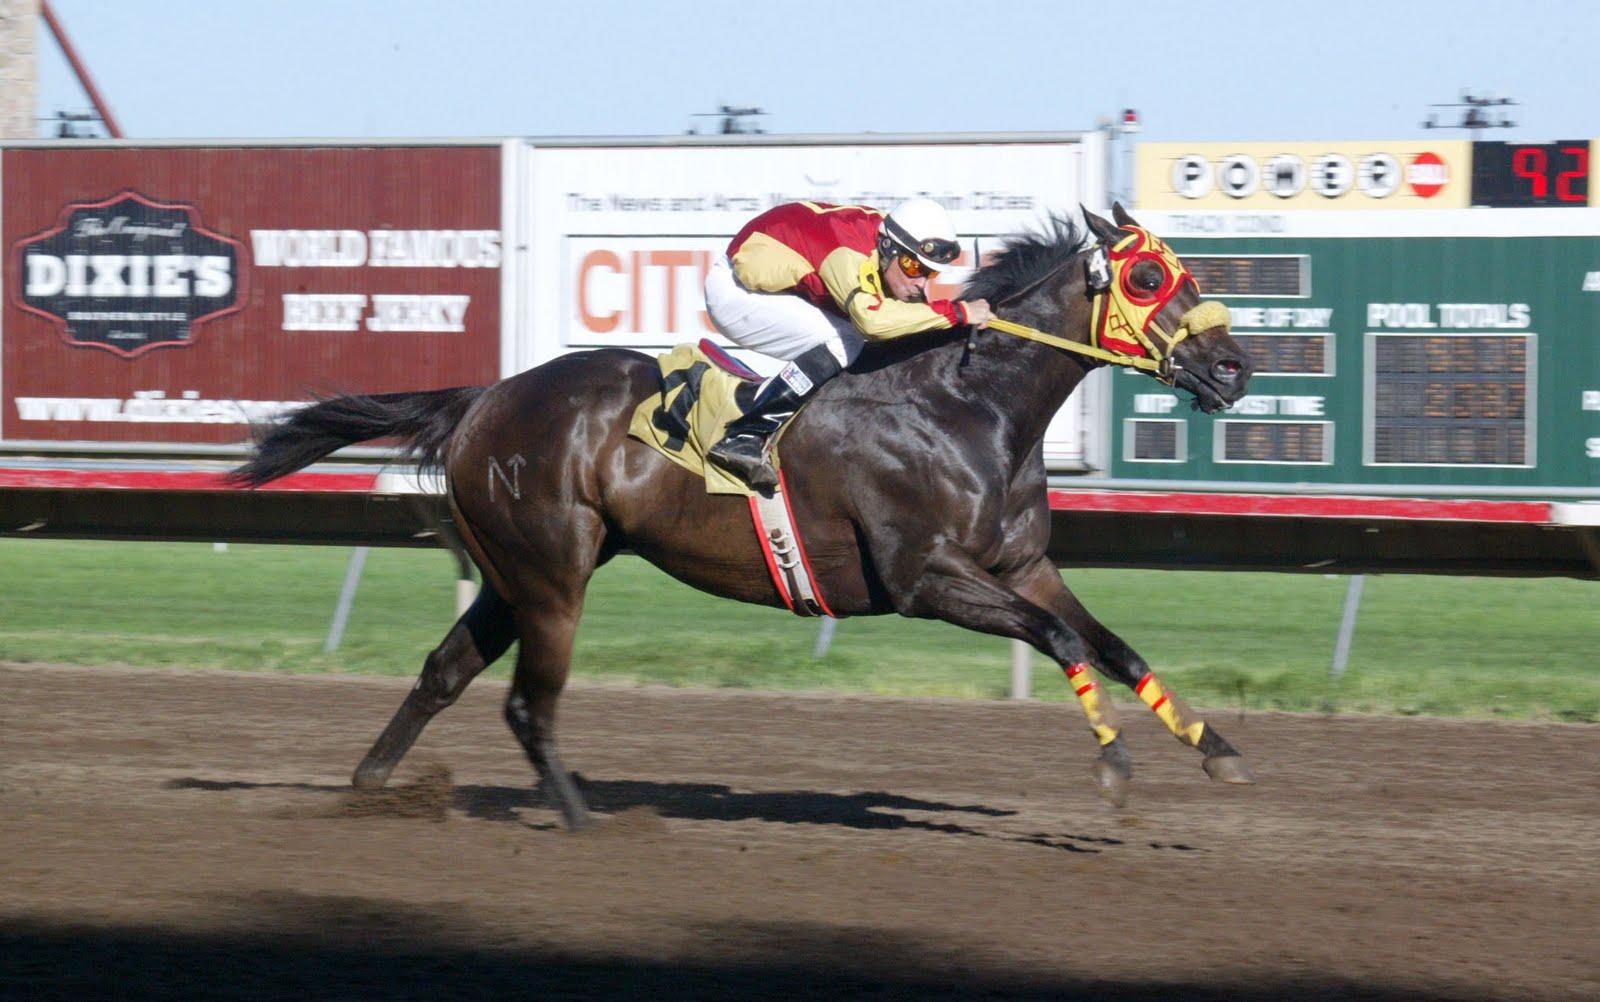 Quarter Horse Images Pictures amp Photos  CrystalGraphics